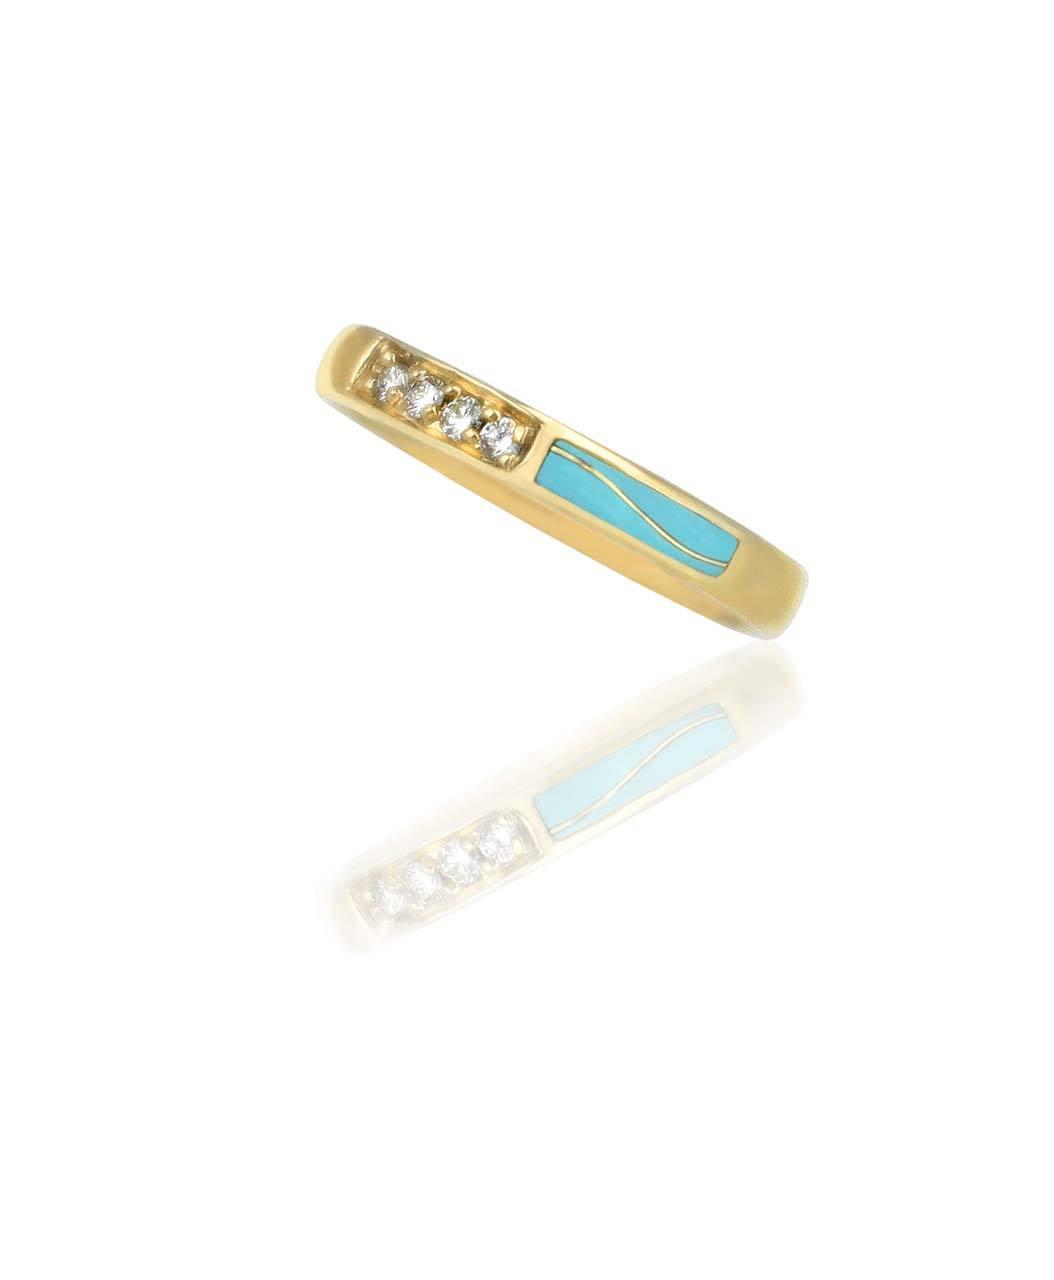 Maverick's 14K Gold Band Diamonds And Turquoise Wave